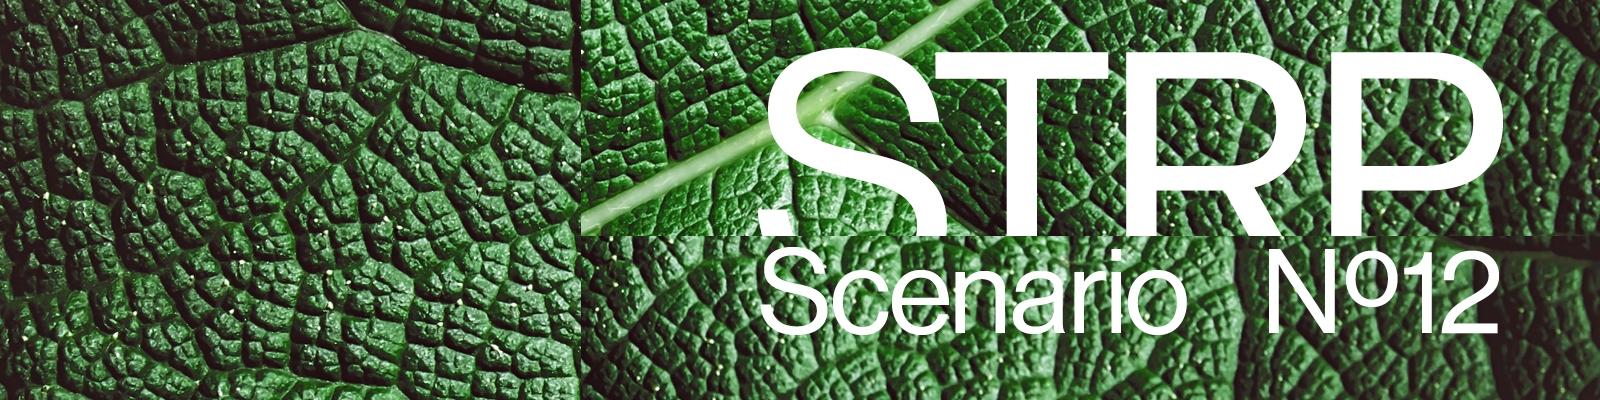 STRP 2021 Social Li Event Scenario12 1600x400